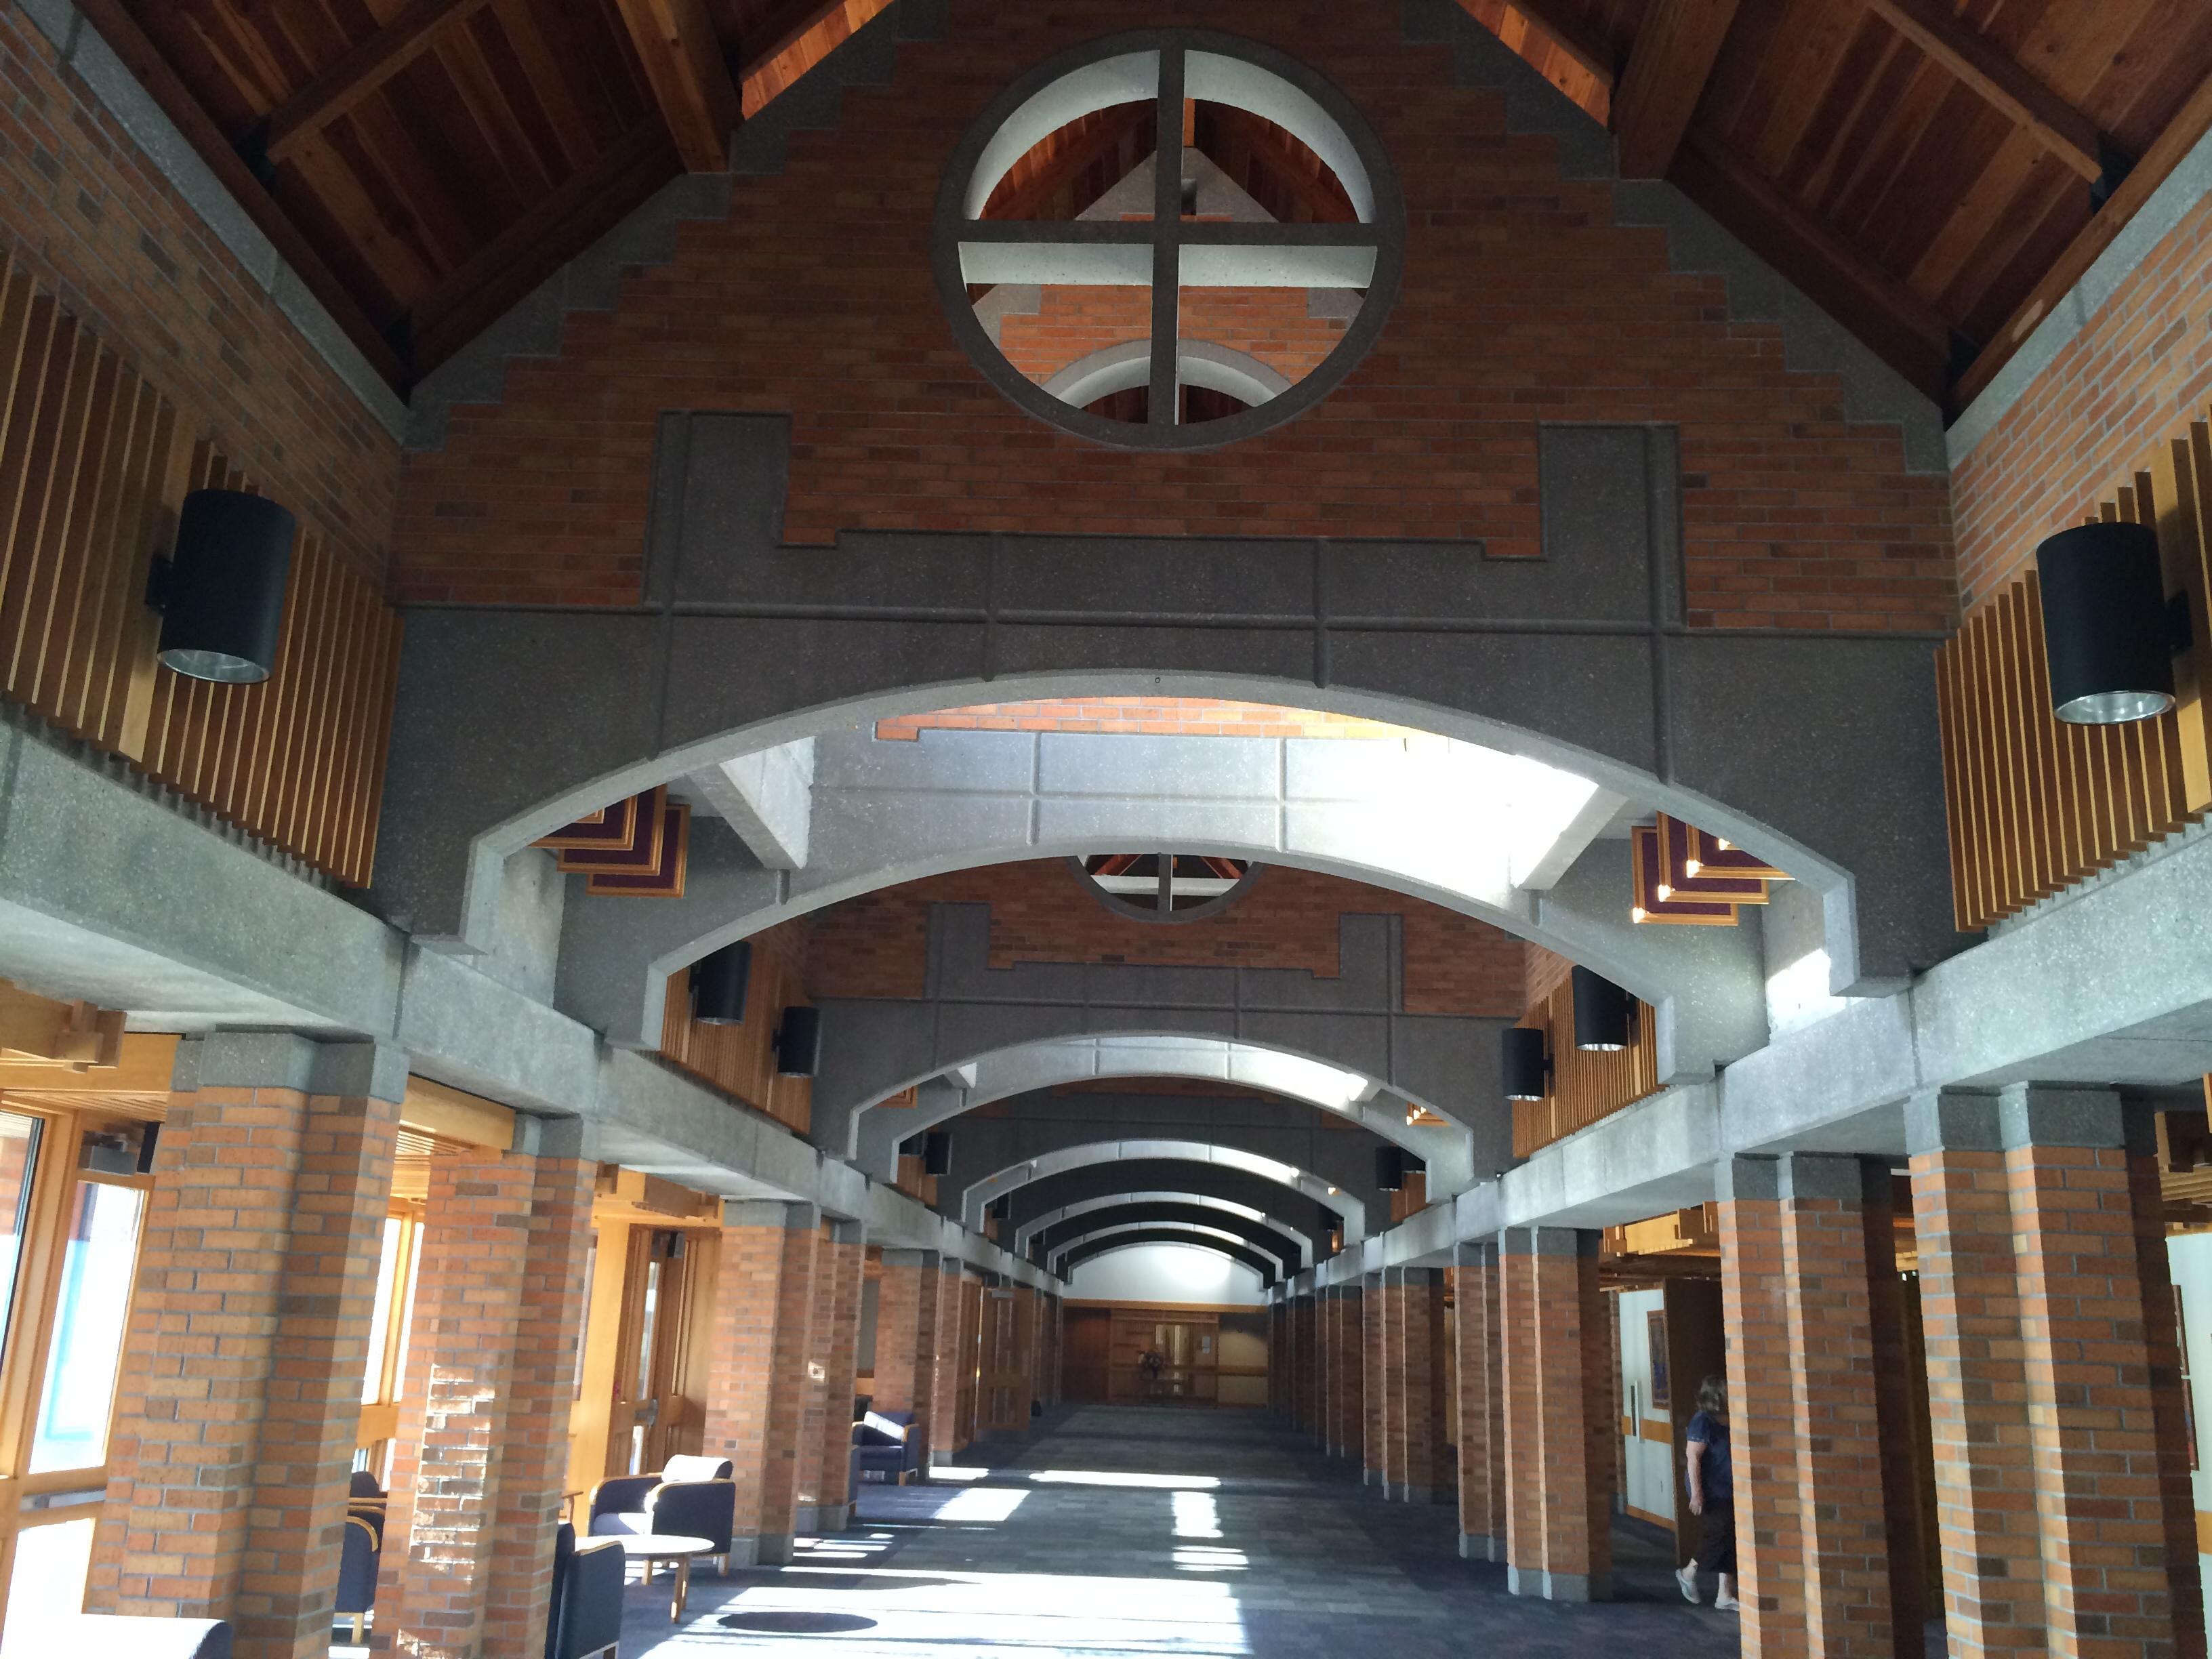 Nebraska Five-Day Academy for Spiritual Formation St. Benedict Center, Schuyler, Nebraska (April 27-May 2, 2014)